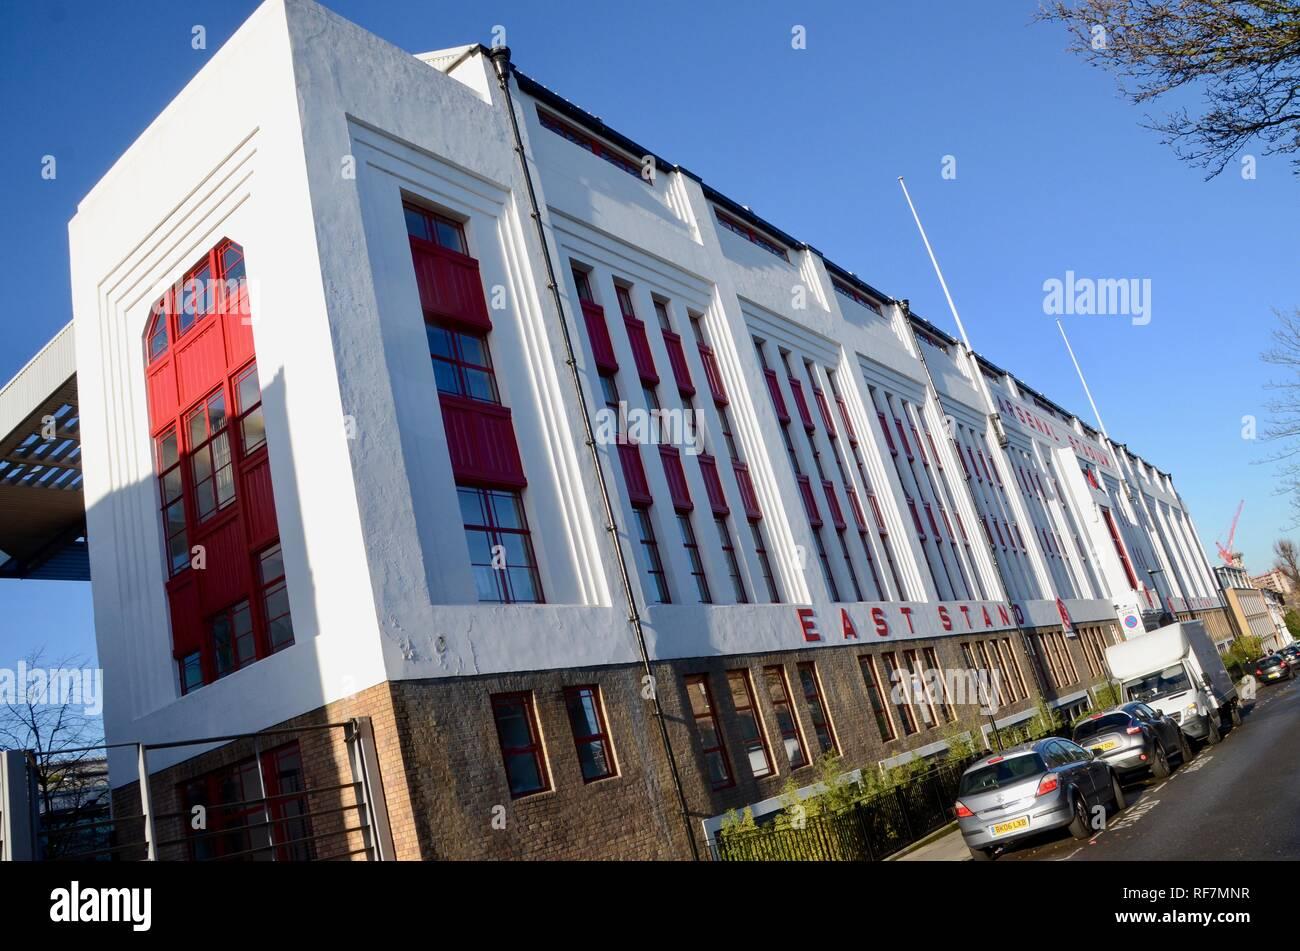 Highbury Stadium Square High Resolution Stock Photography And Images Alamy